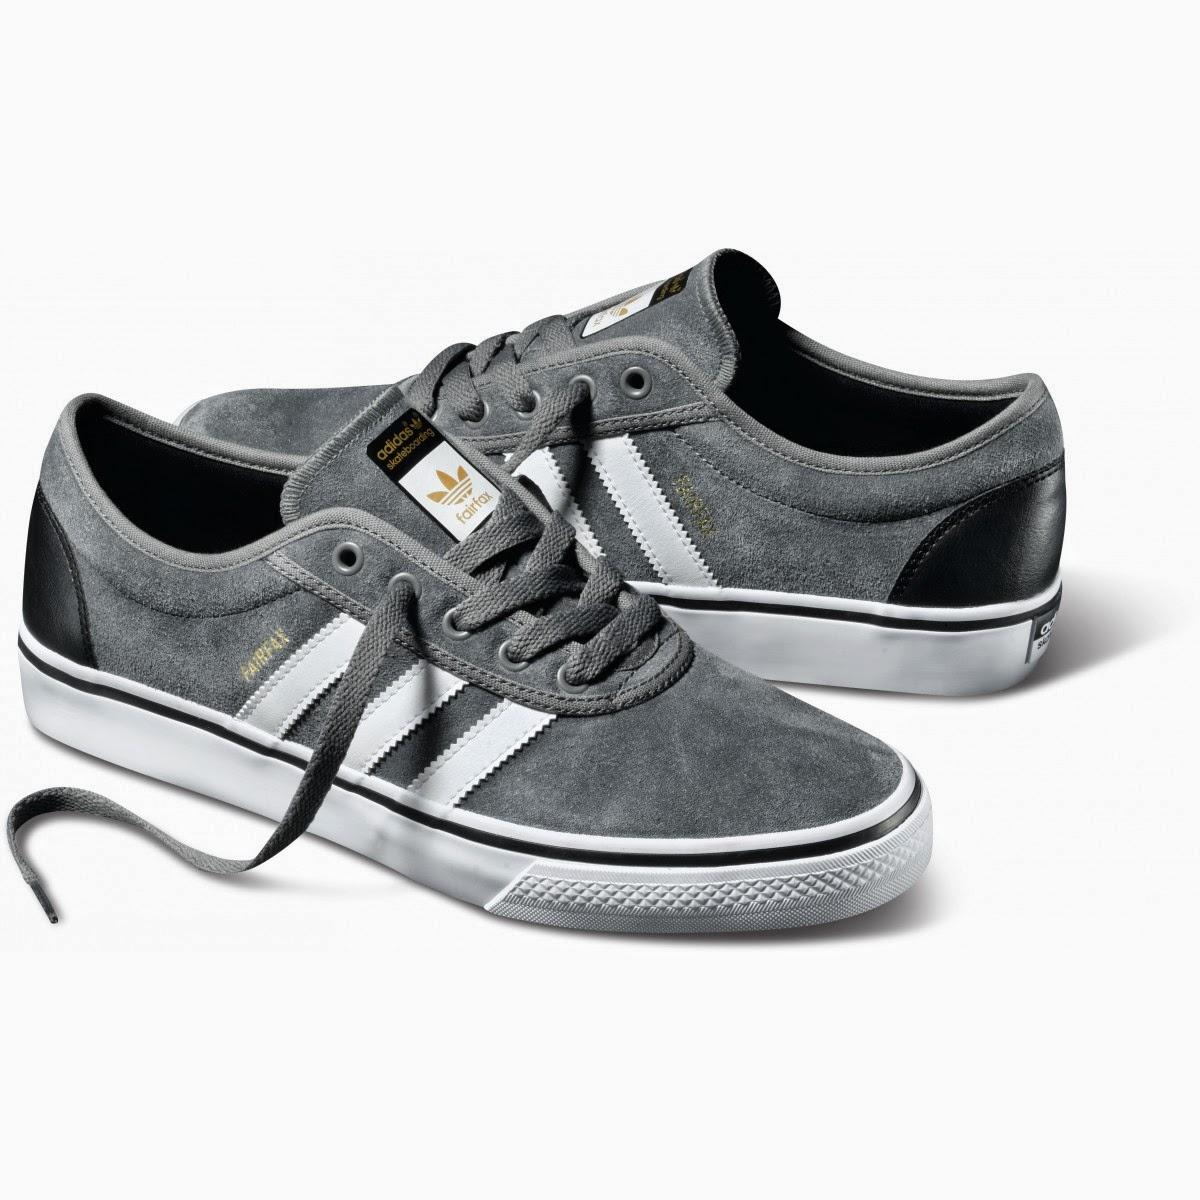 reputable site f5d35 13b32 adidas Skateboarding Adi Ease